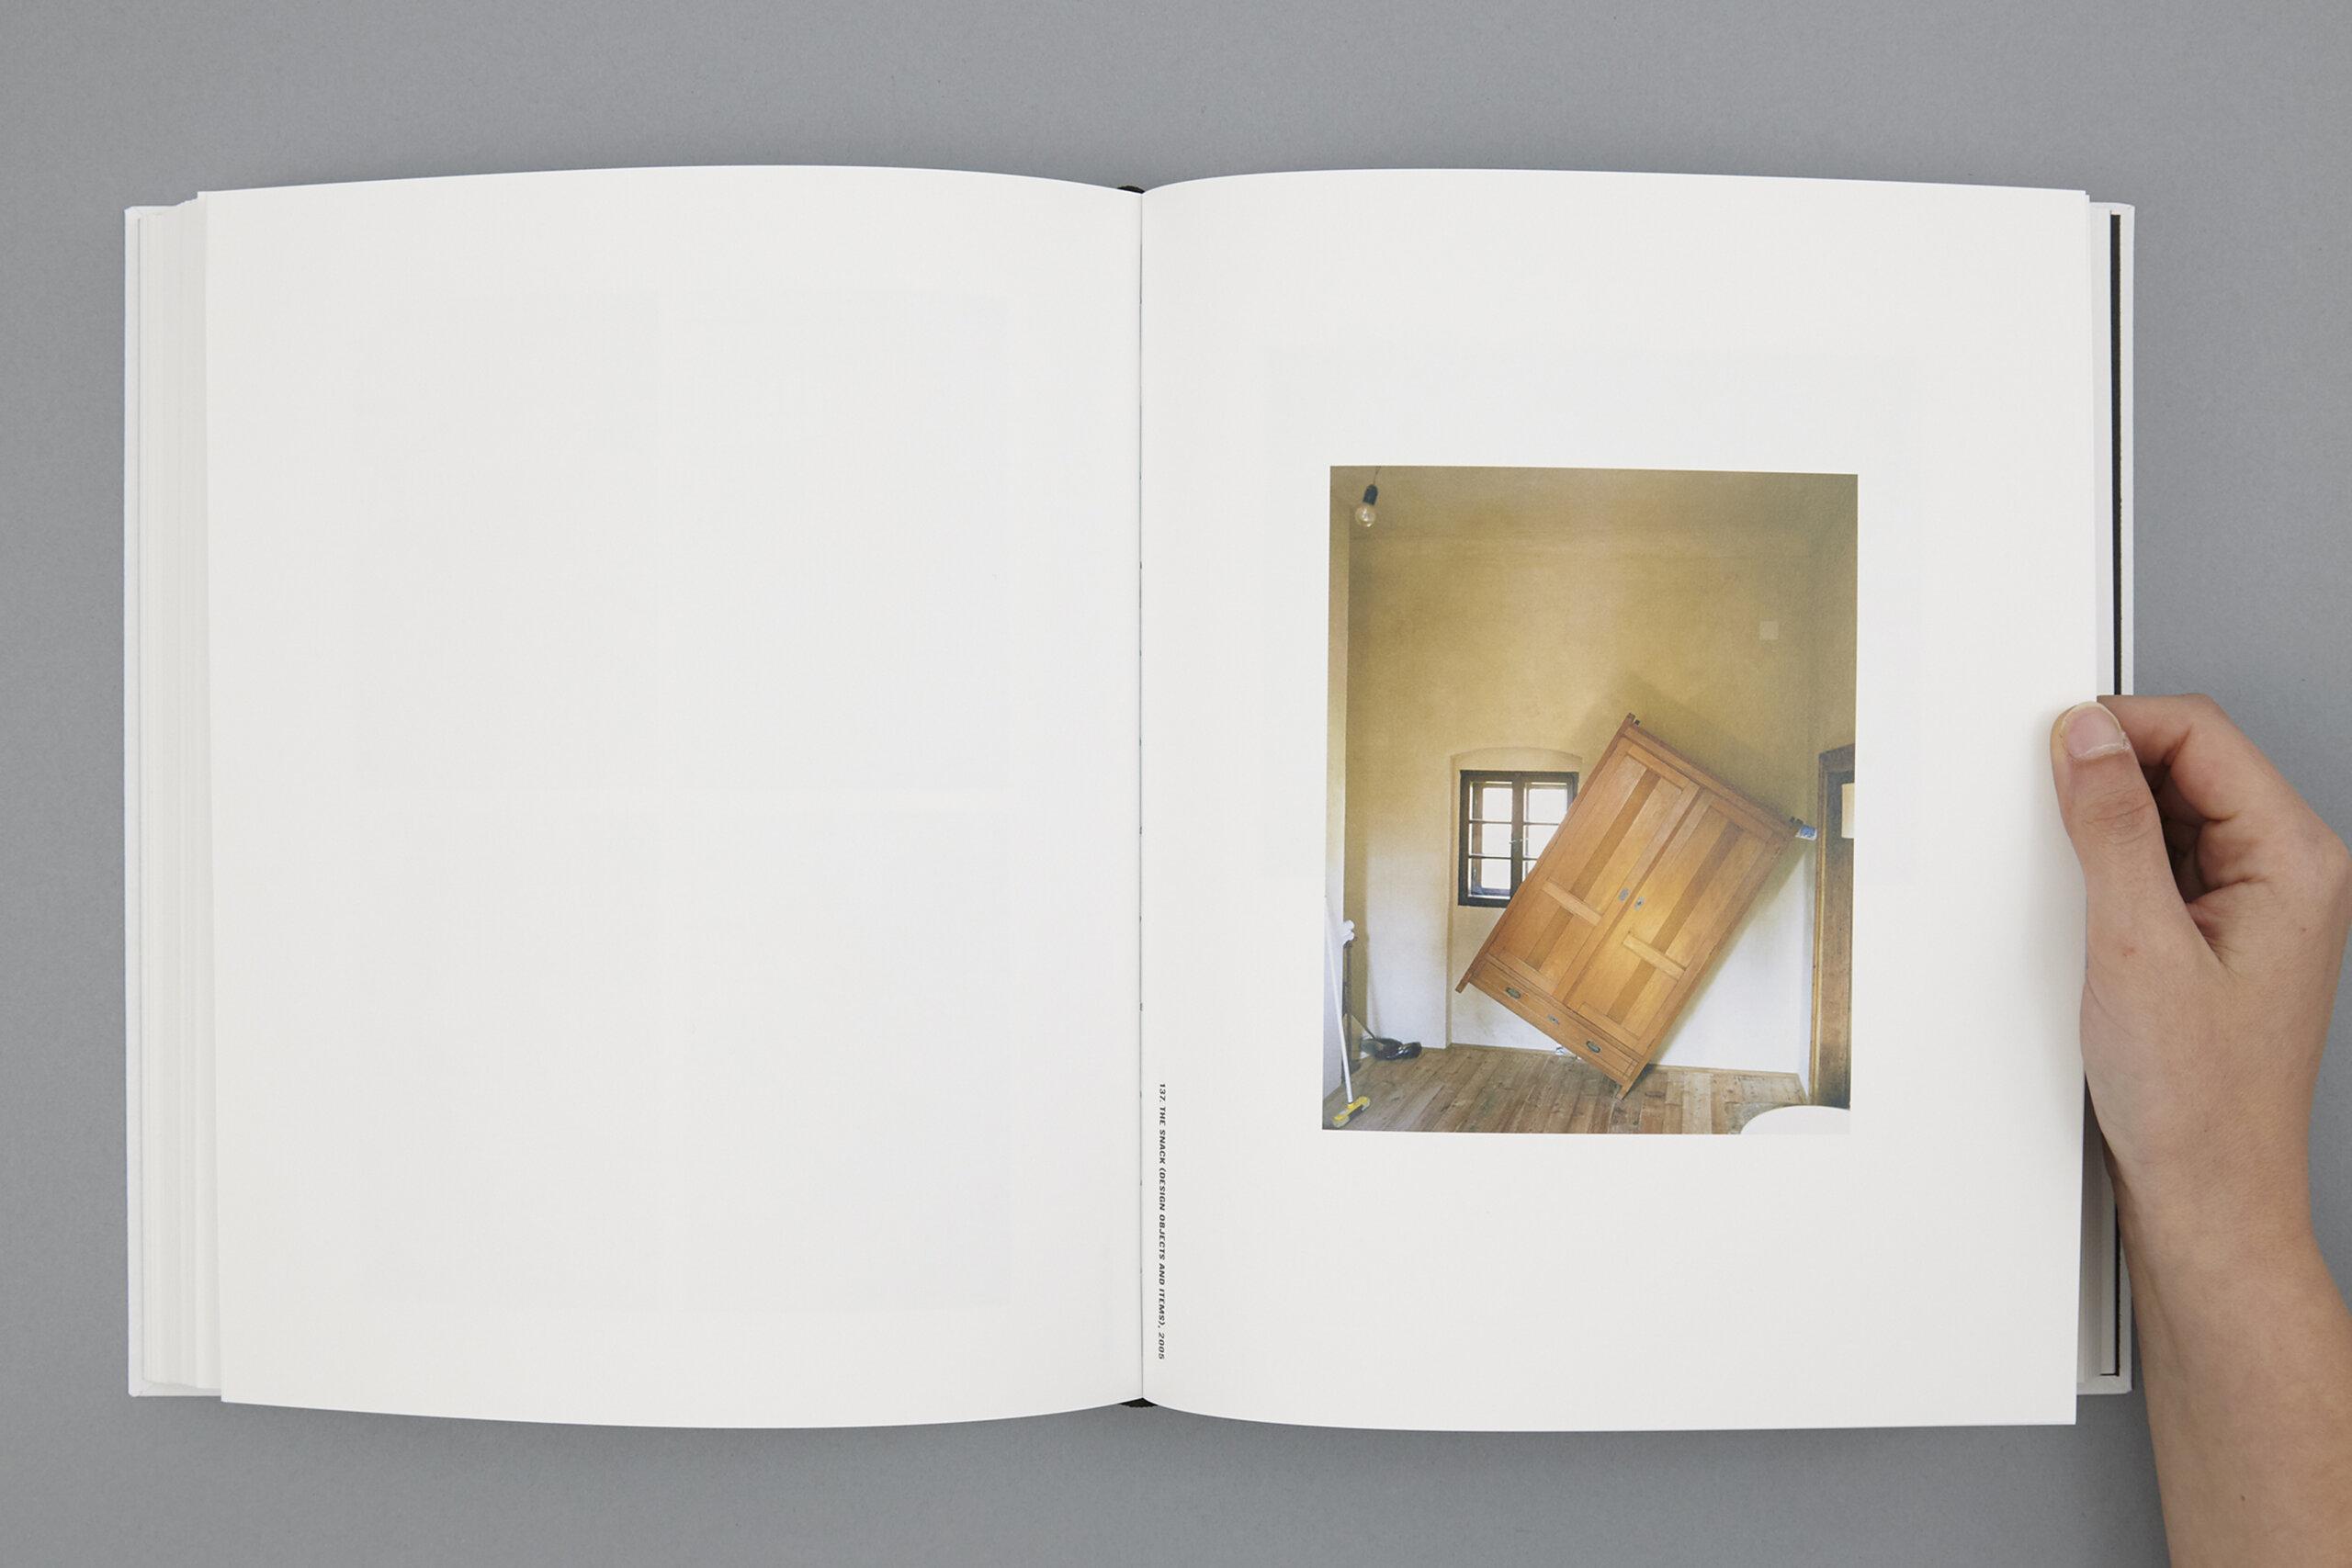 wurm-photographs-delpire-co-4